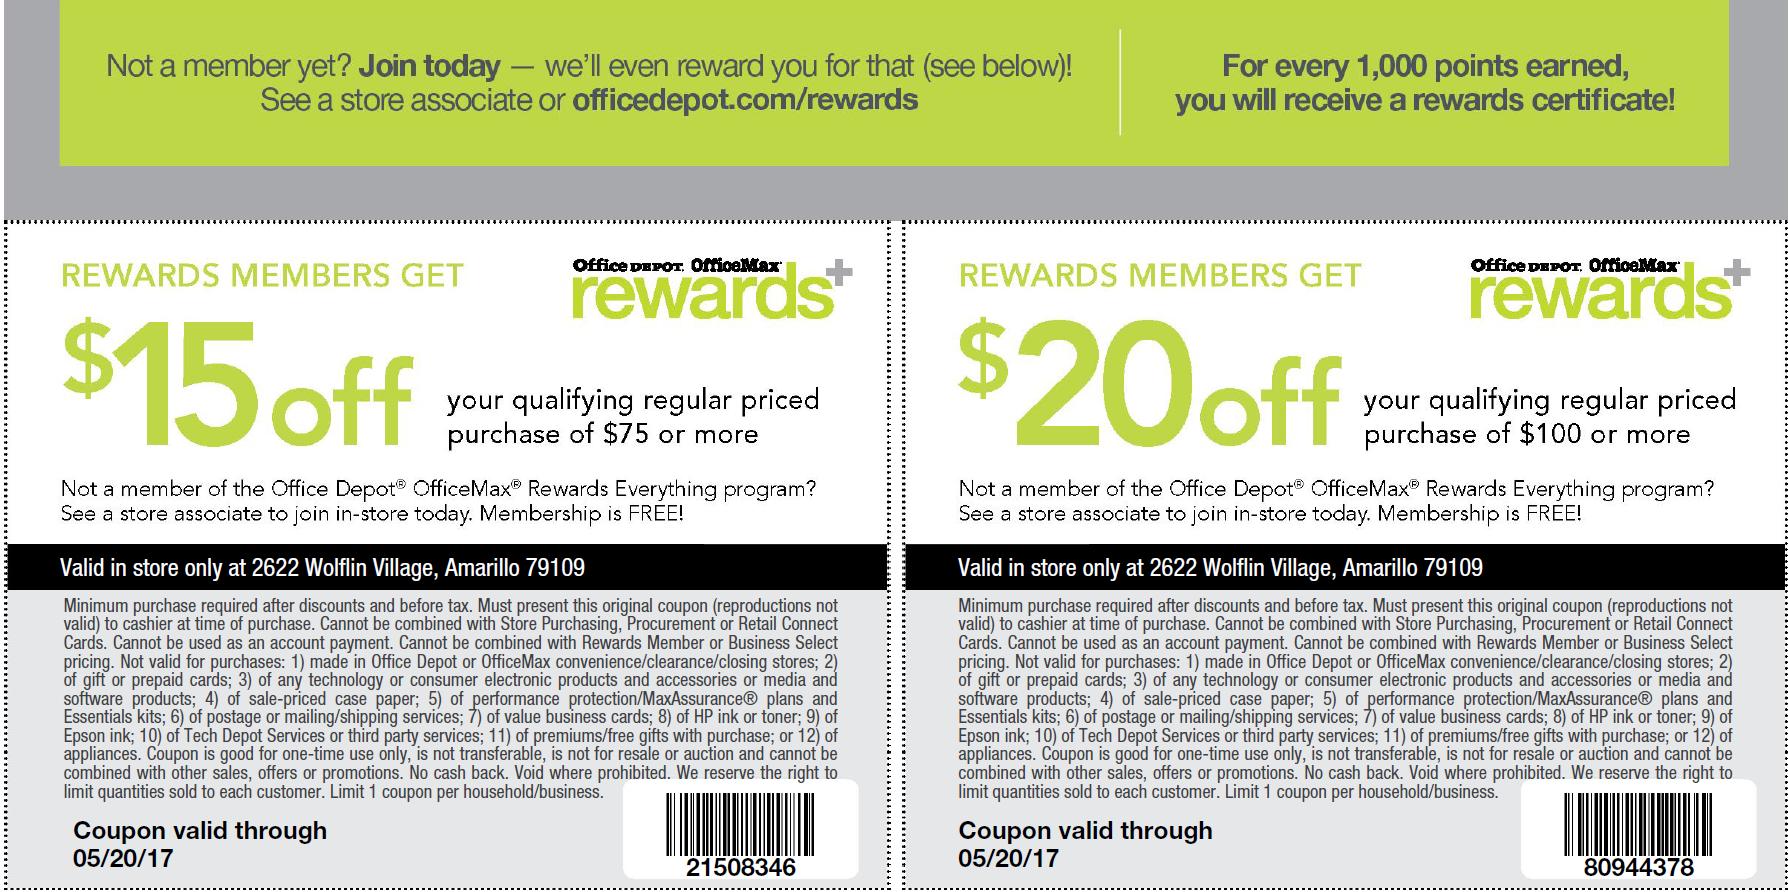 Office depot rewards coupons - Image